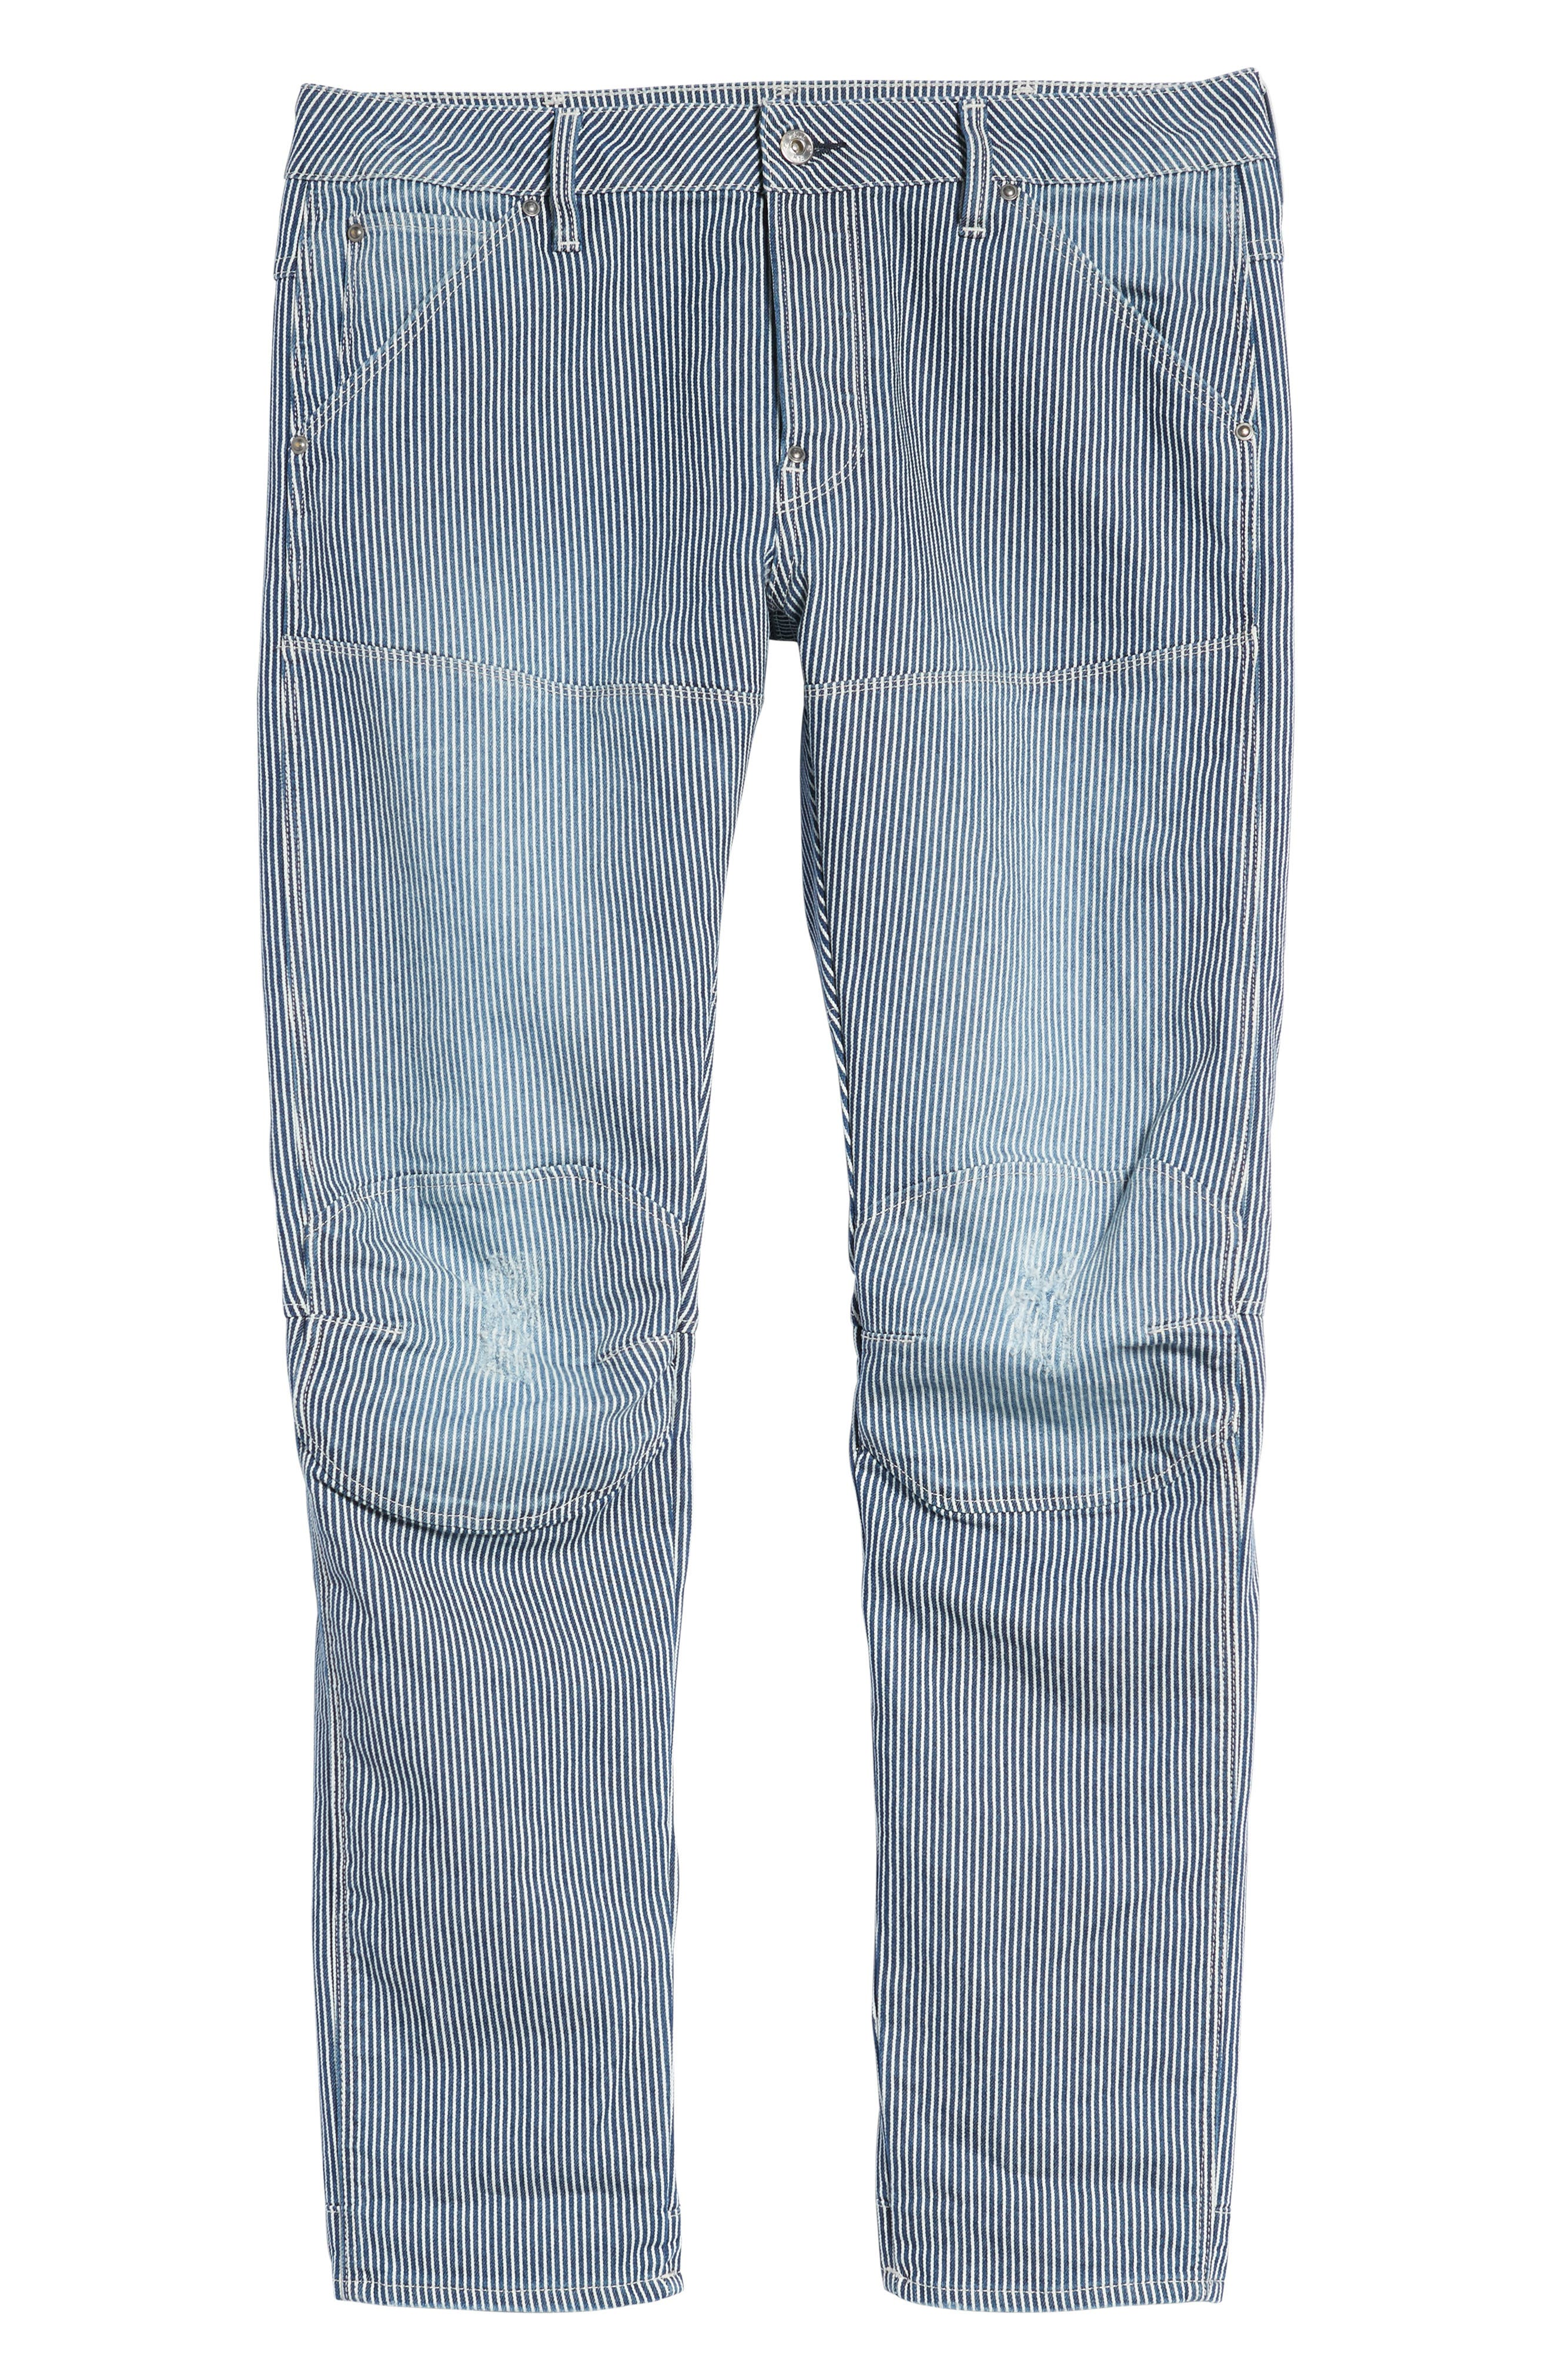 3D Slim Pants,                             Alternate thumbnail 6, color,                             Medium Aged Destroy